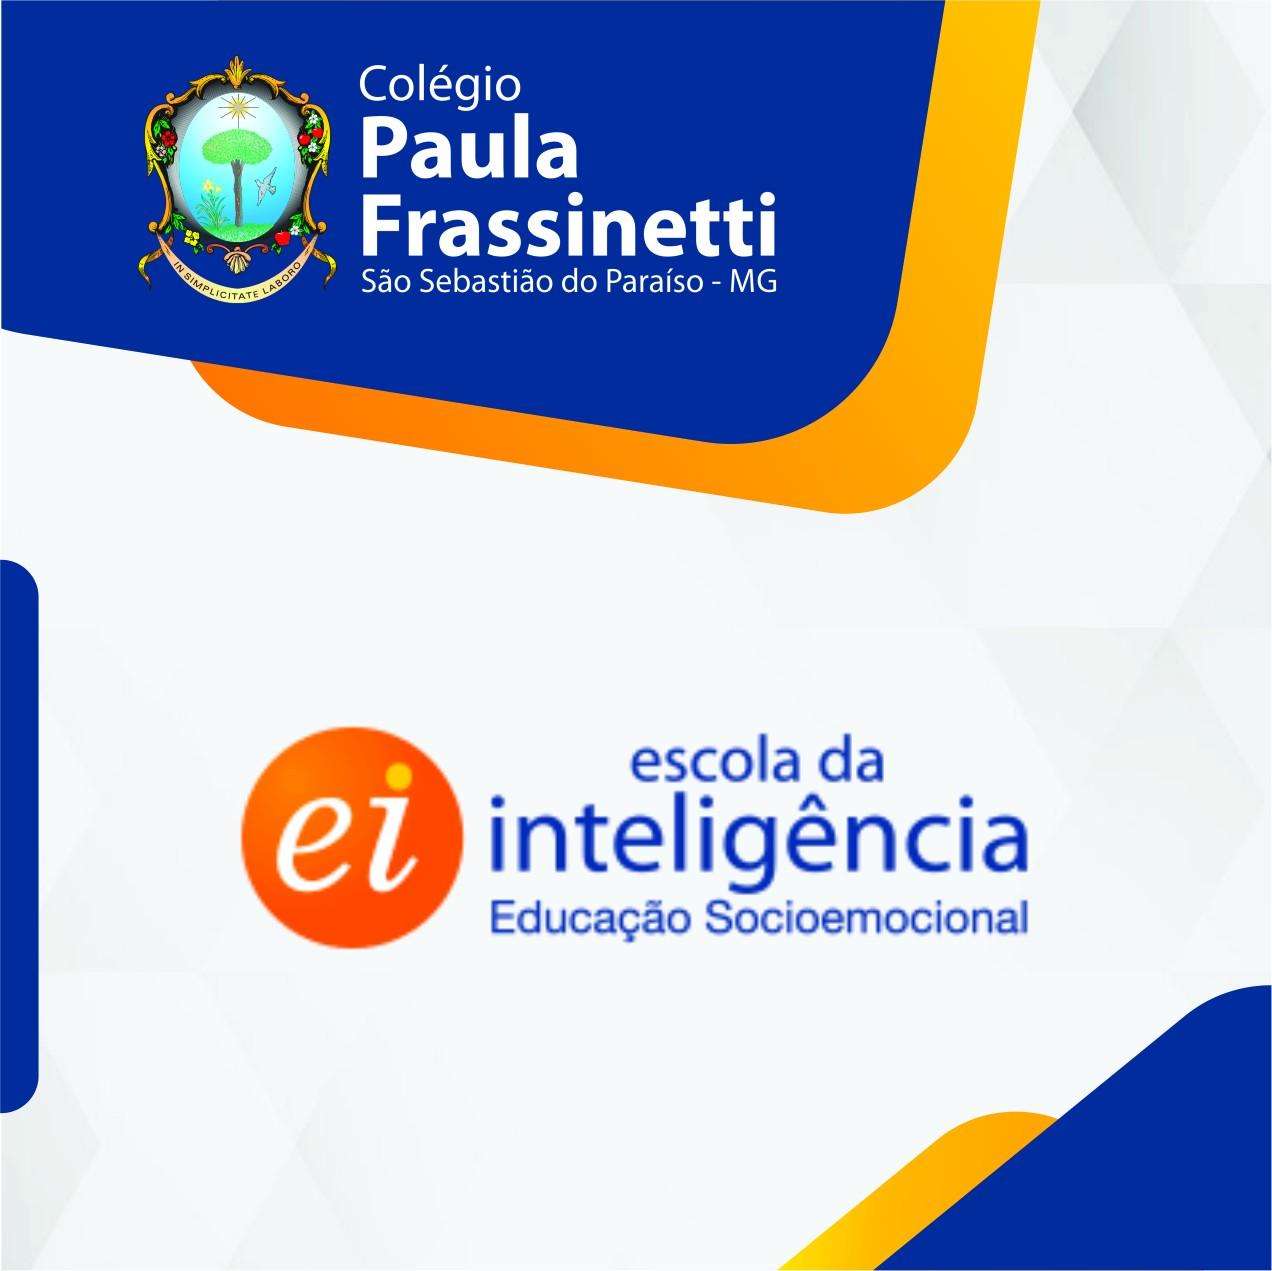 Escola da Inteligência